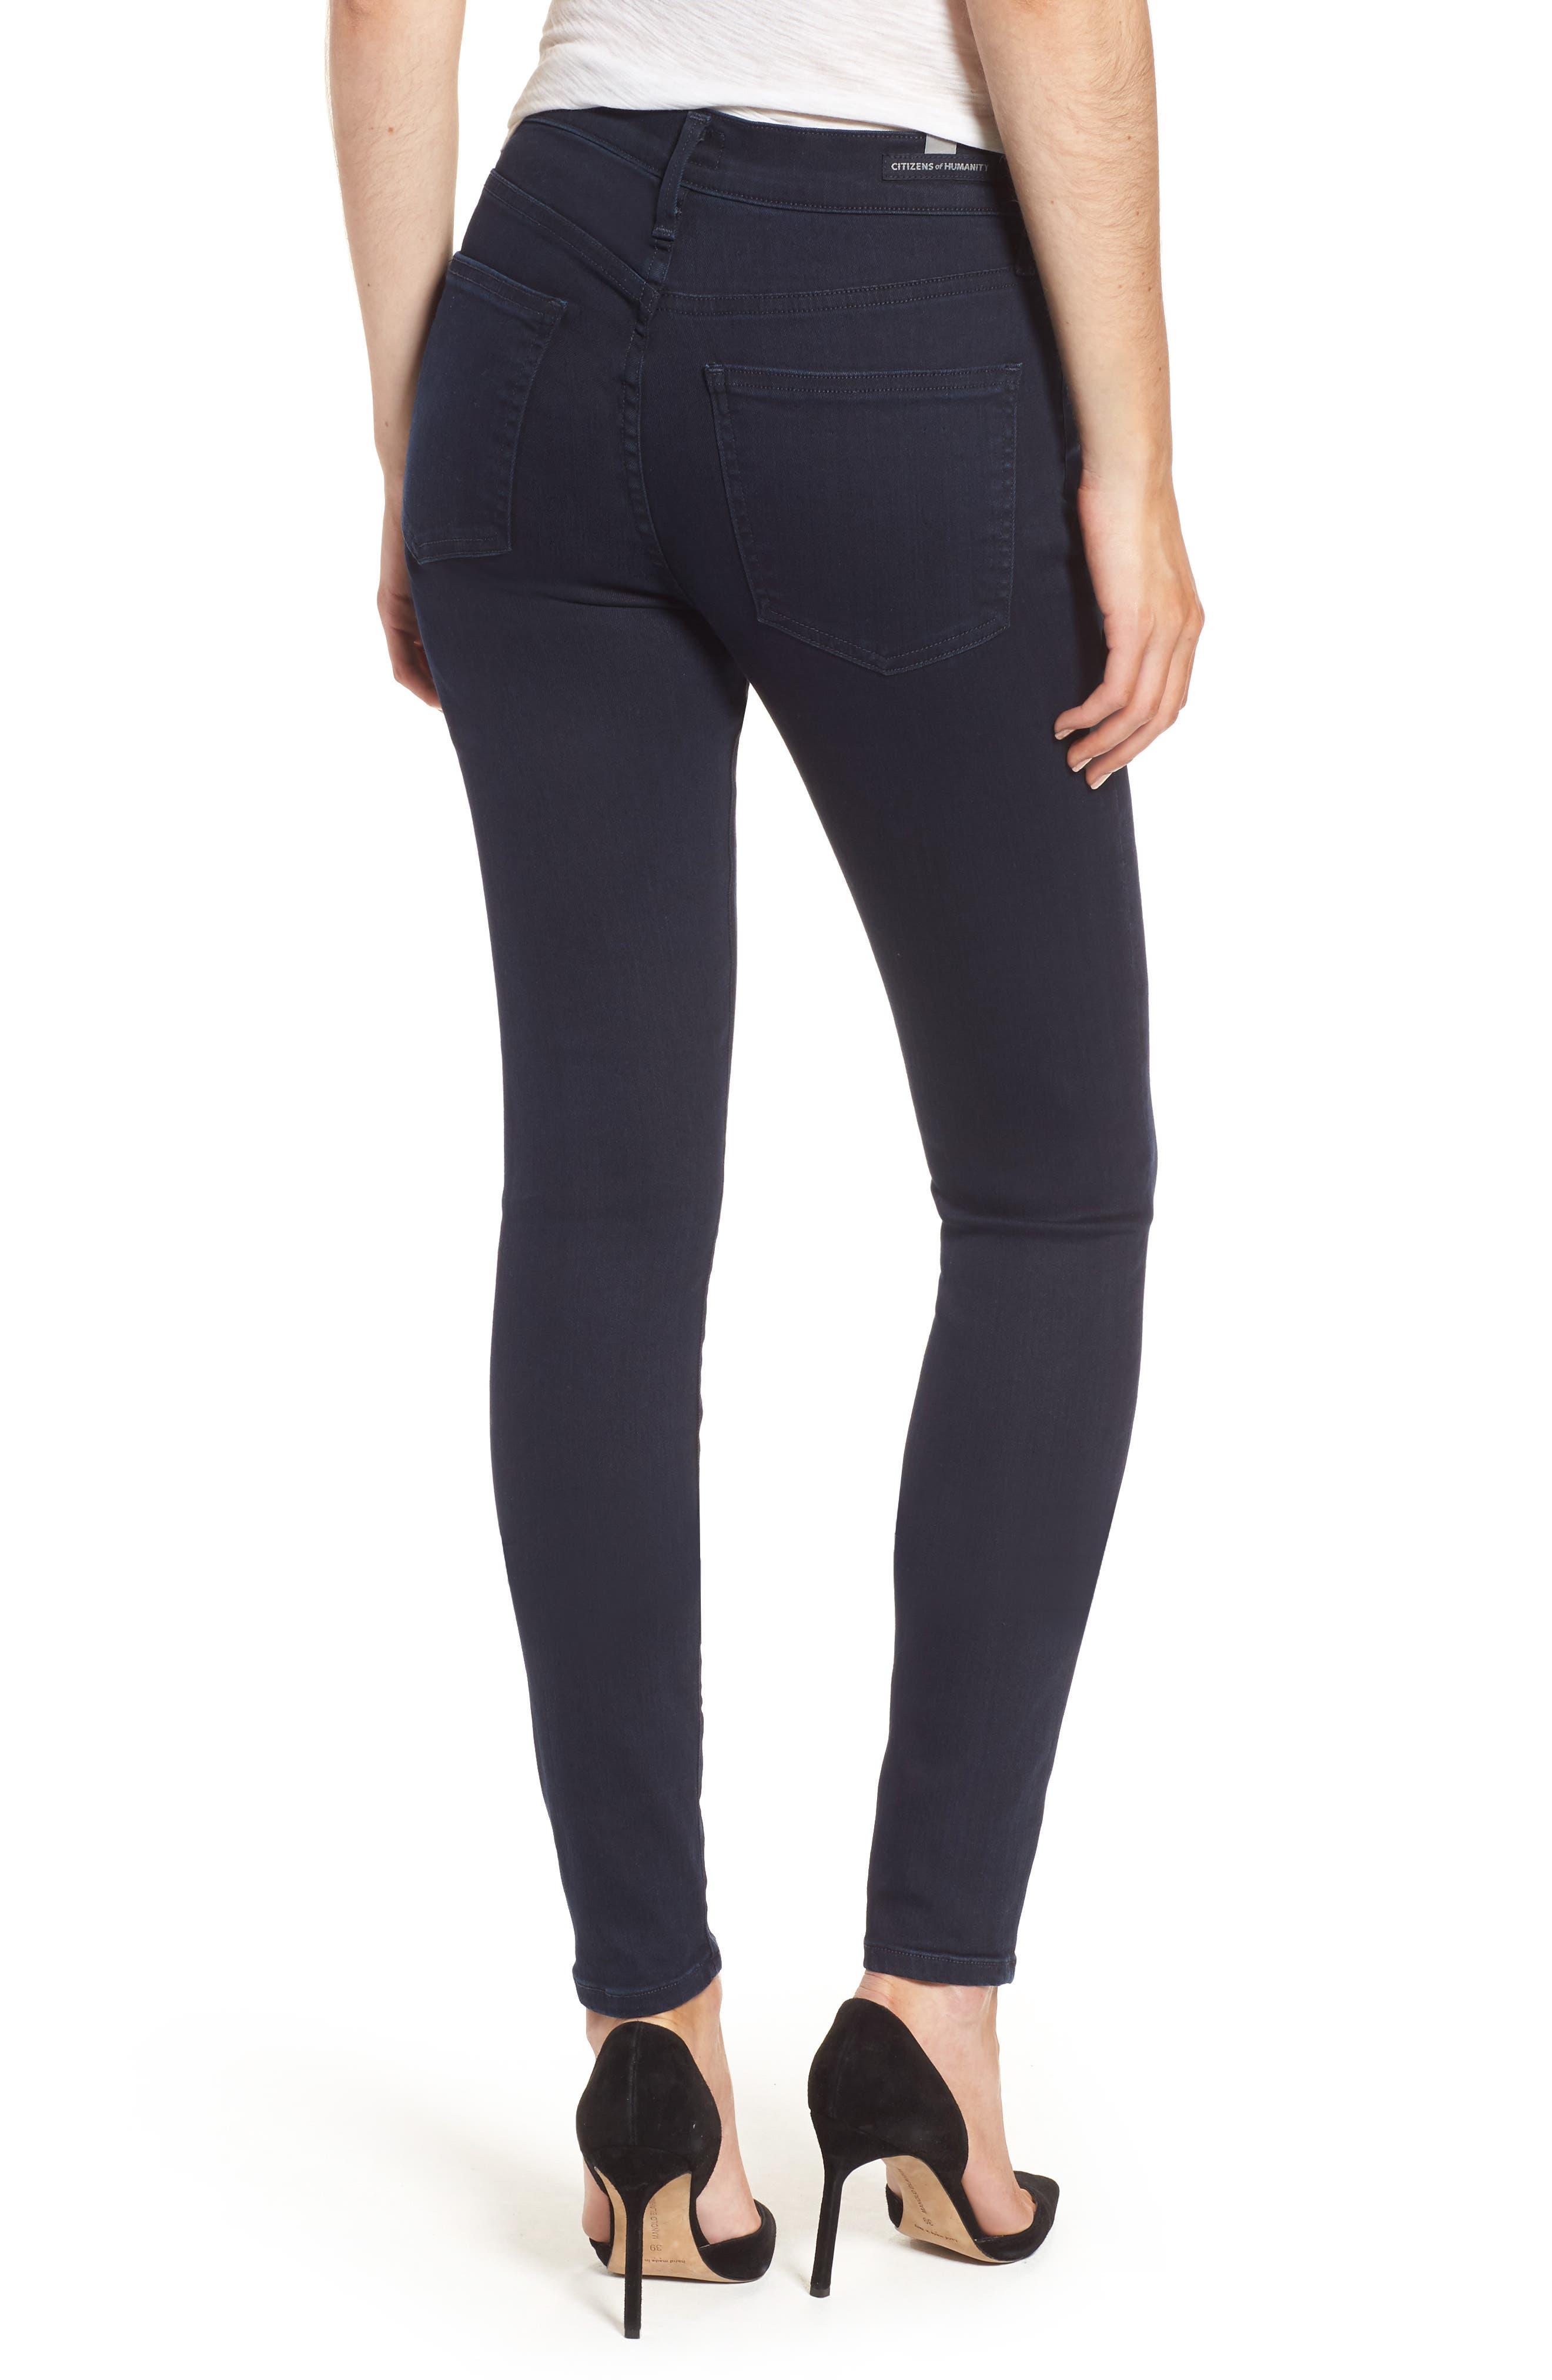 Rocket High Waist Skinny Jeans,                             Alternate thumbnail 2, color,                             Ozone Ink